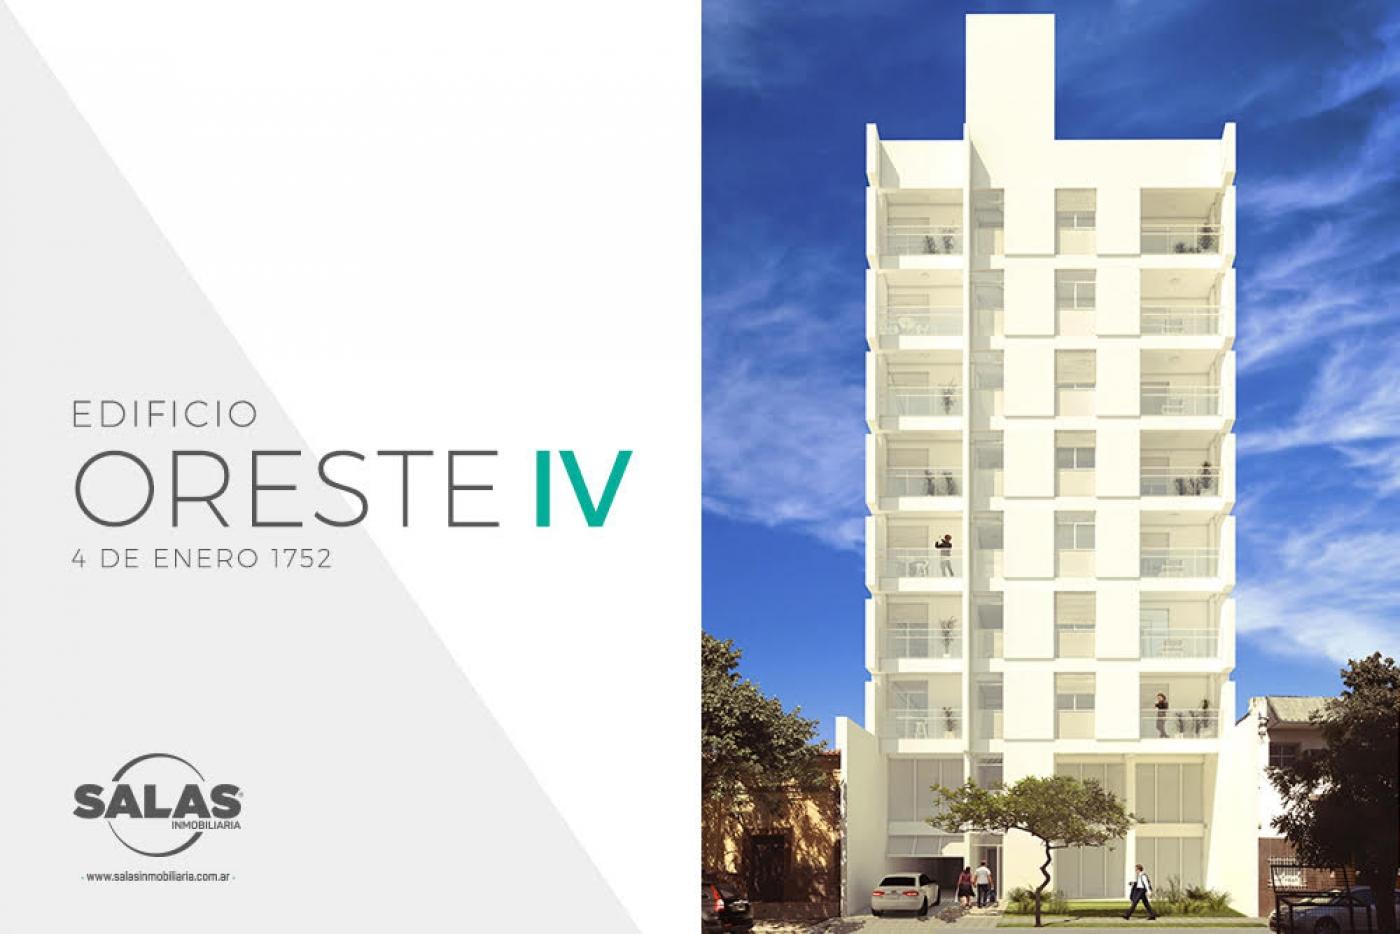 - EDIFICIO ORESTE IV -